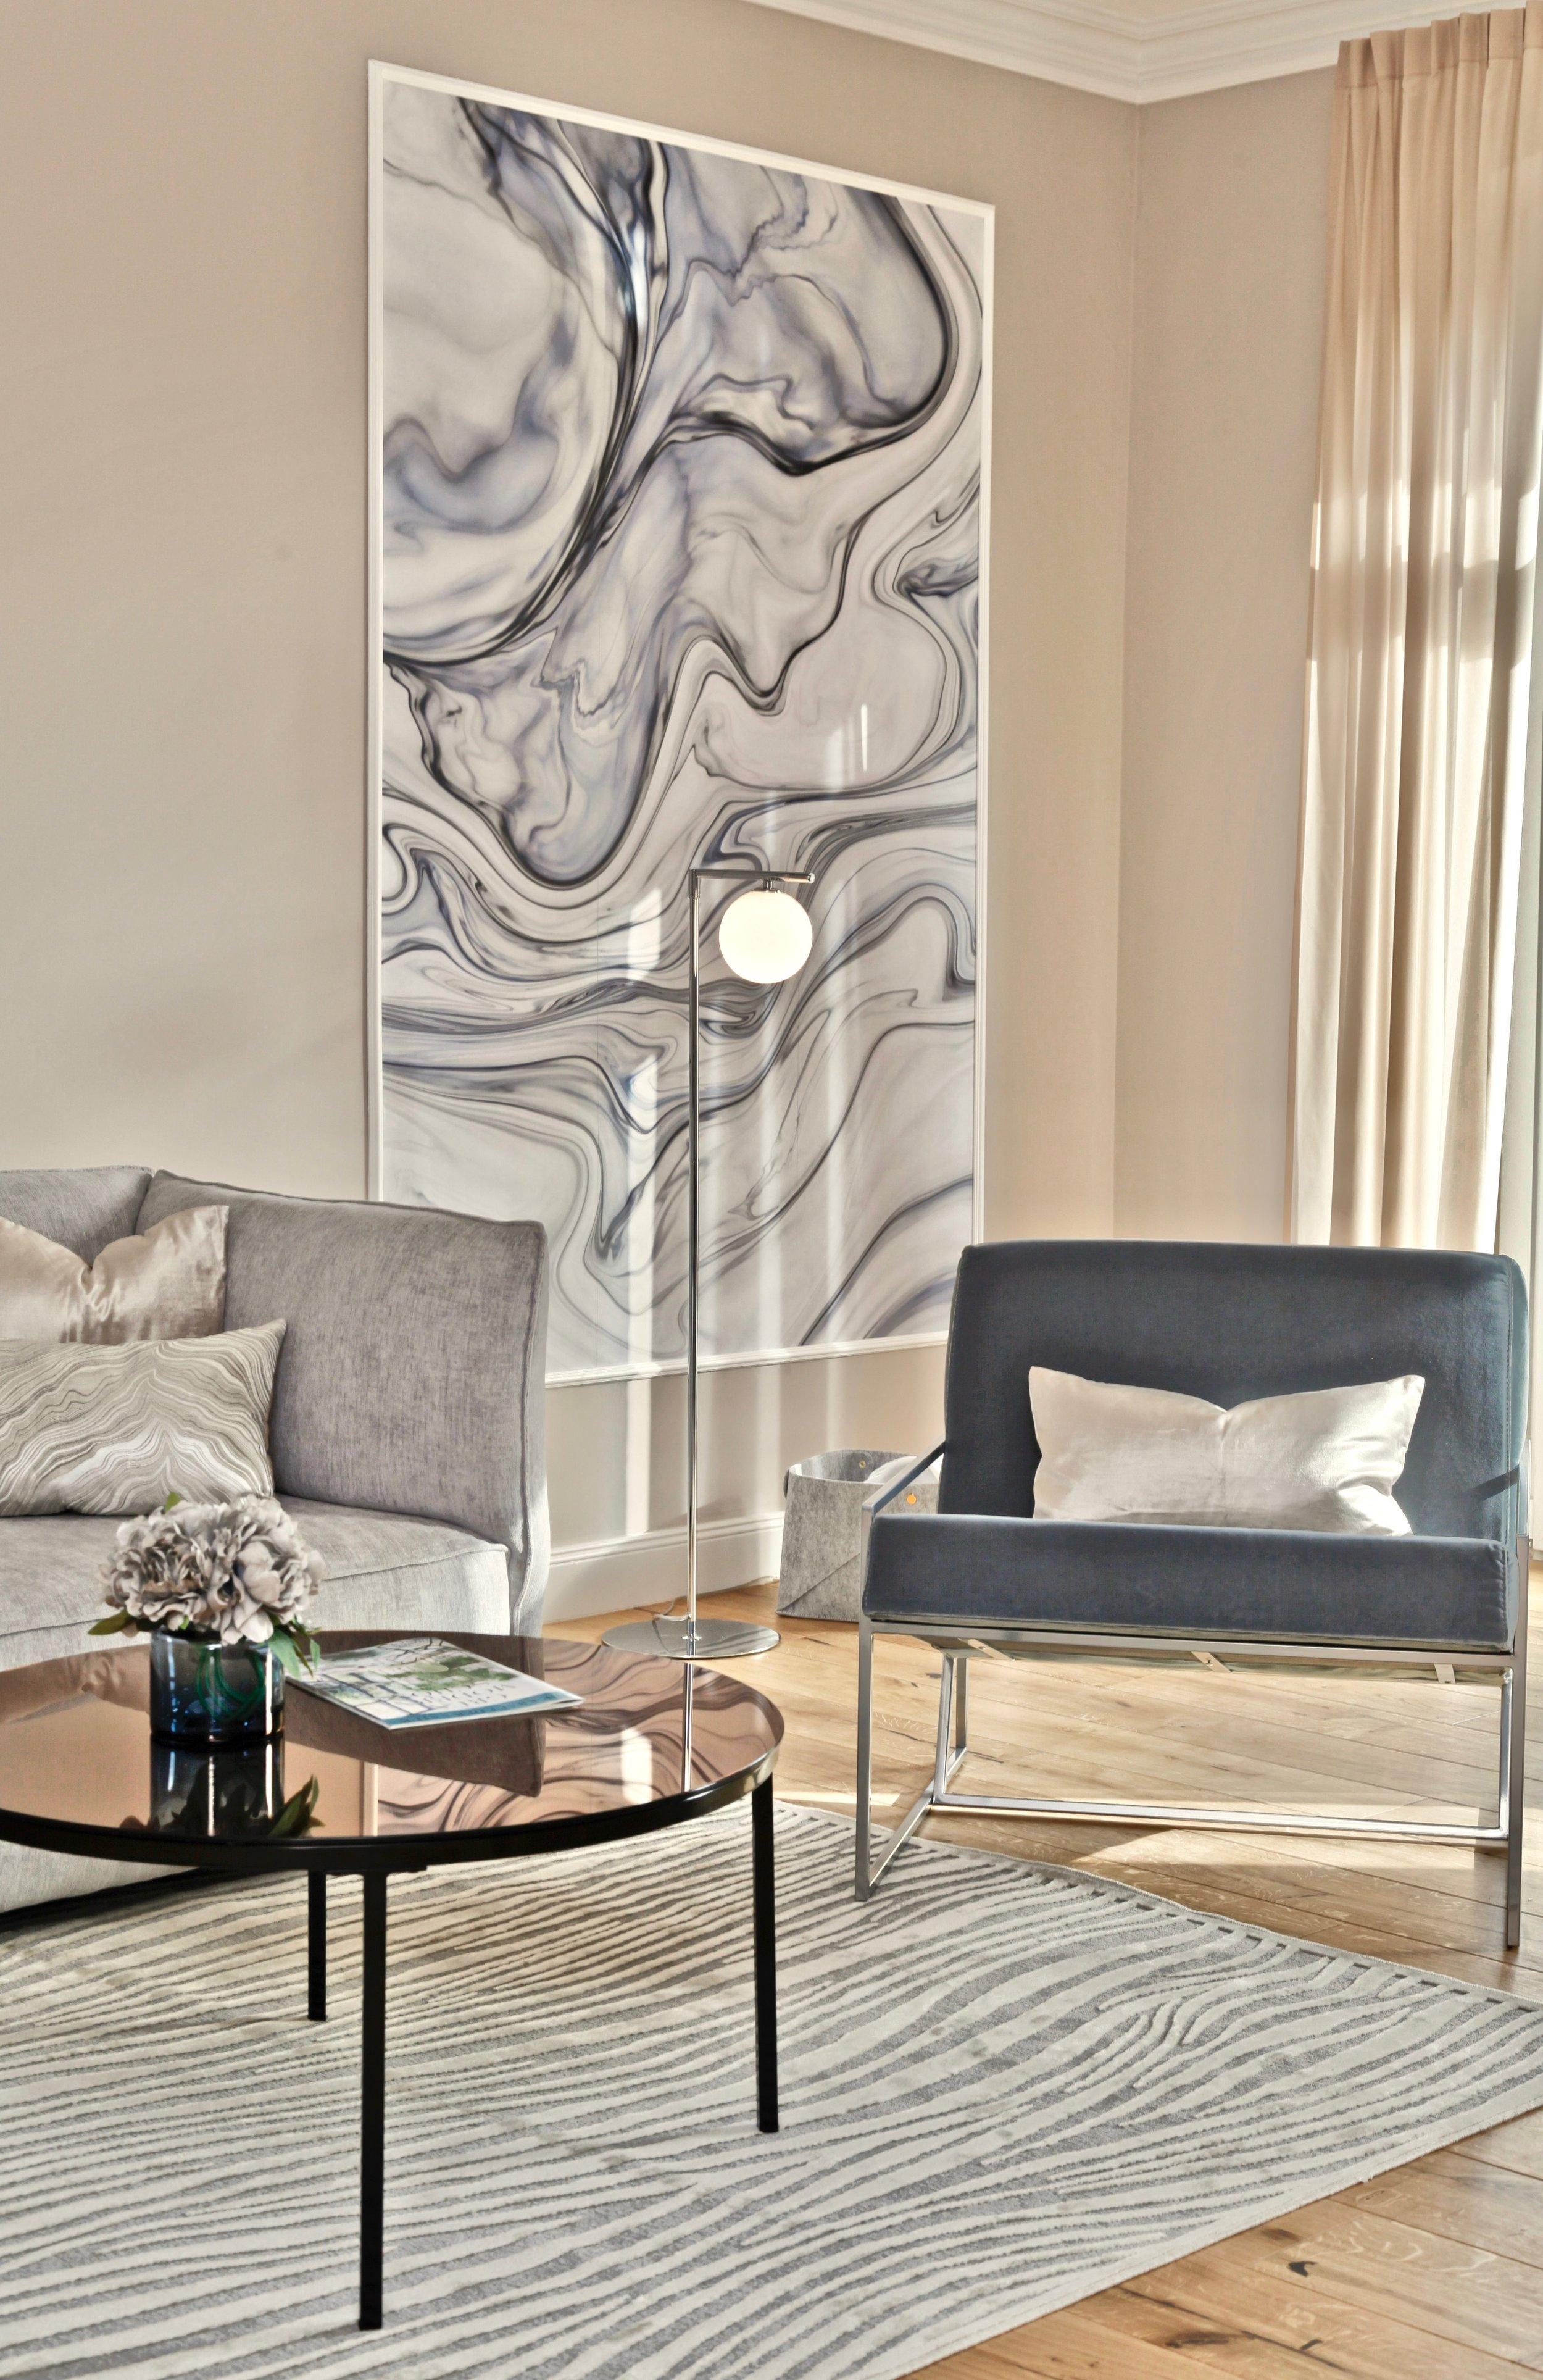 Musterwohnung in residential building in Berlin designed by Revamp